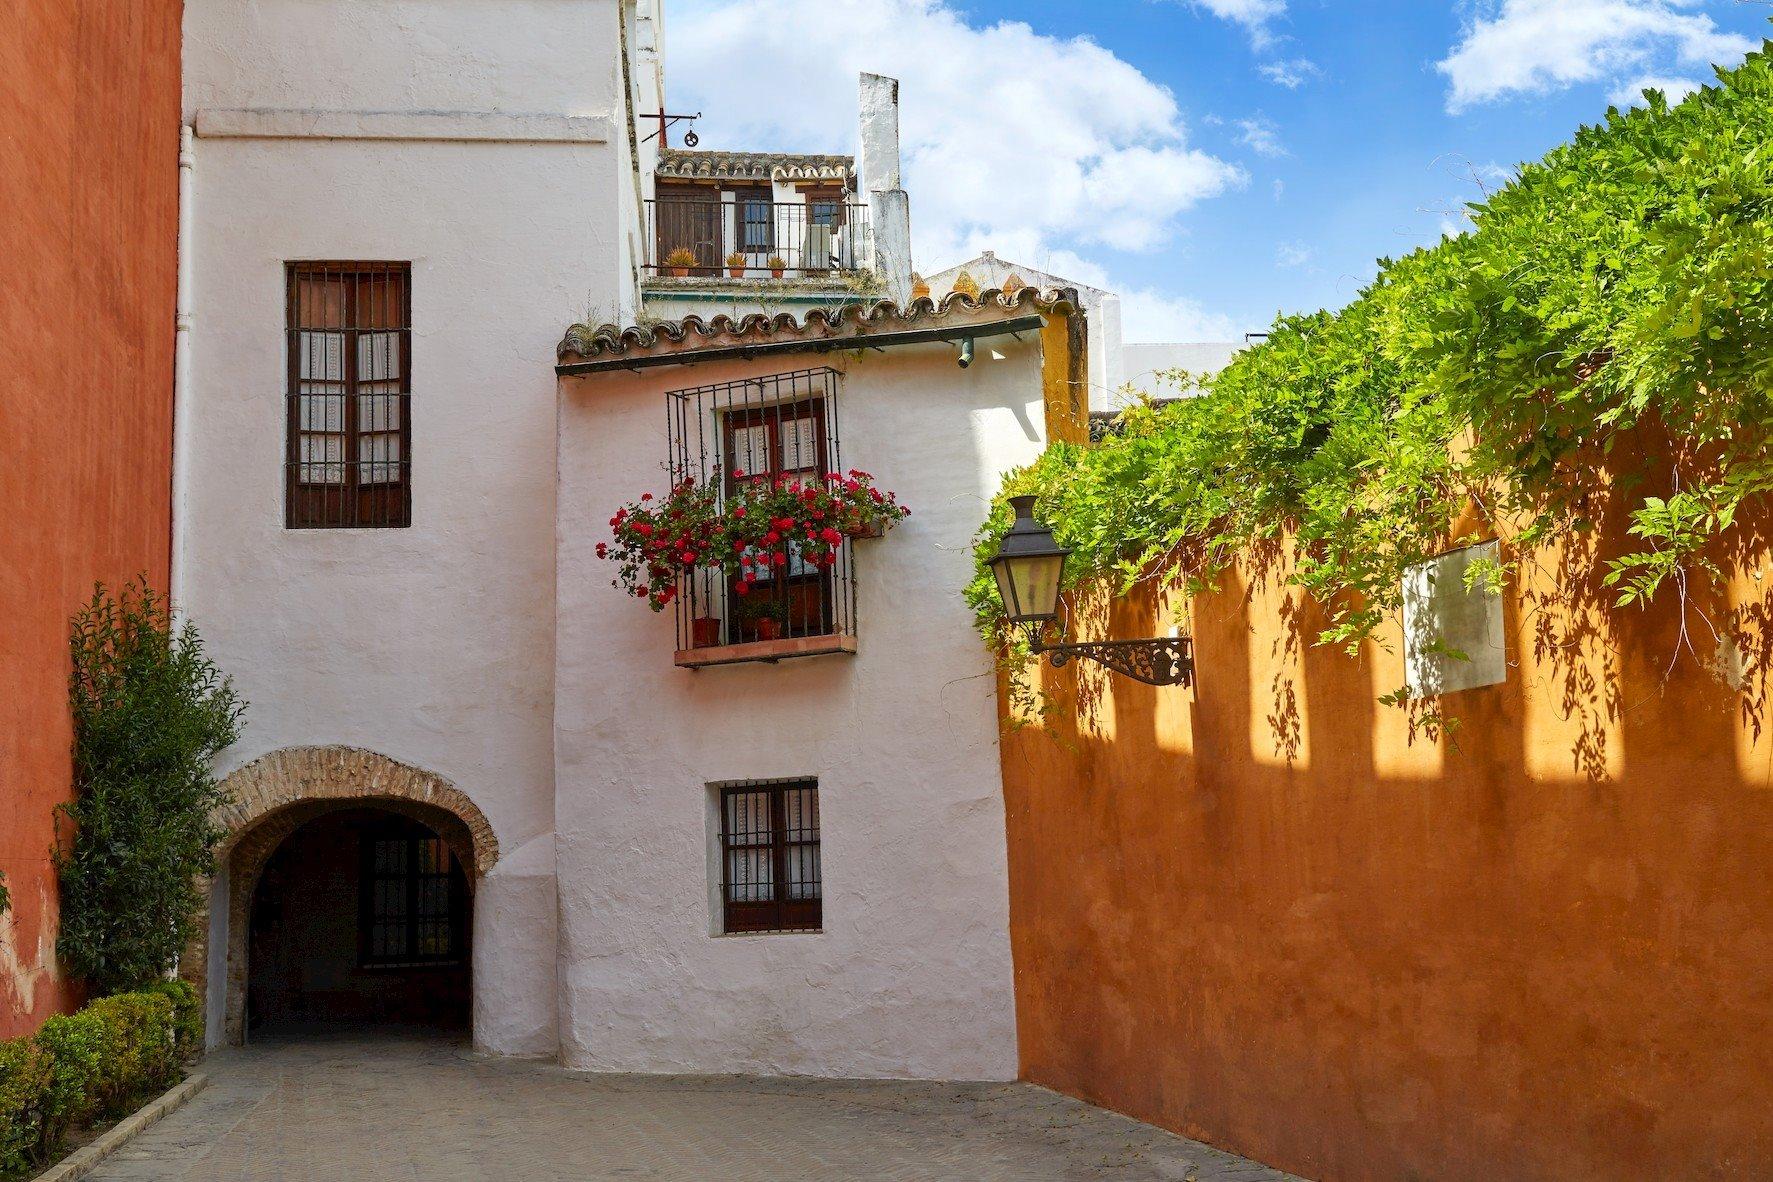 juderia sevilla. Aljama de Santa Cruz, Sevilla